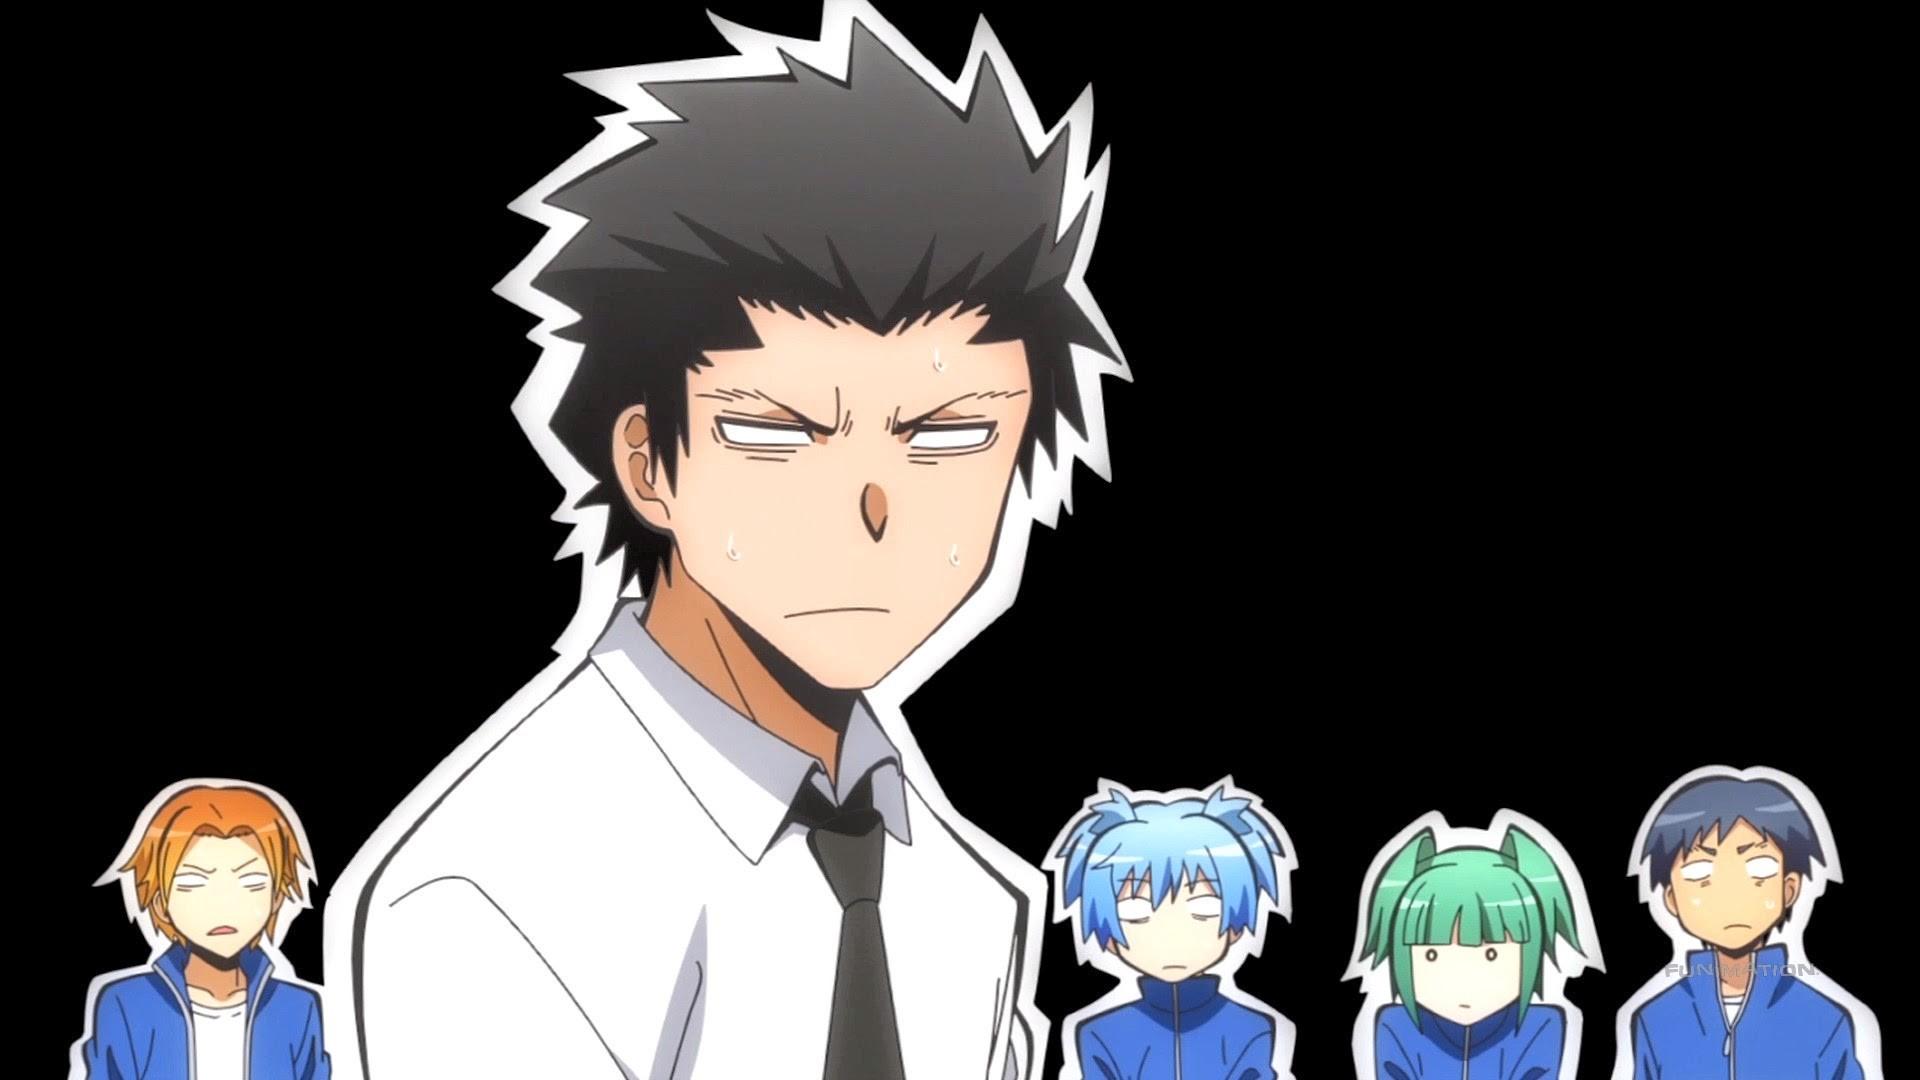 Karasuma-sensei and E-Class – Assassination Classroom